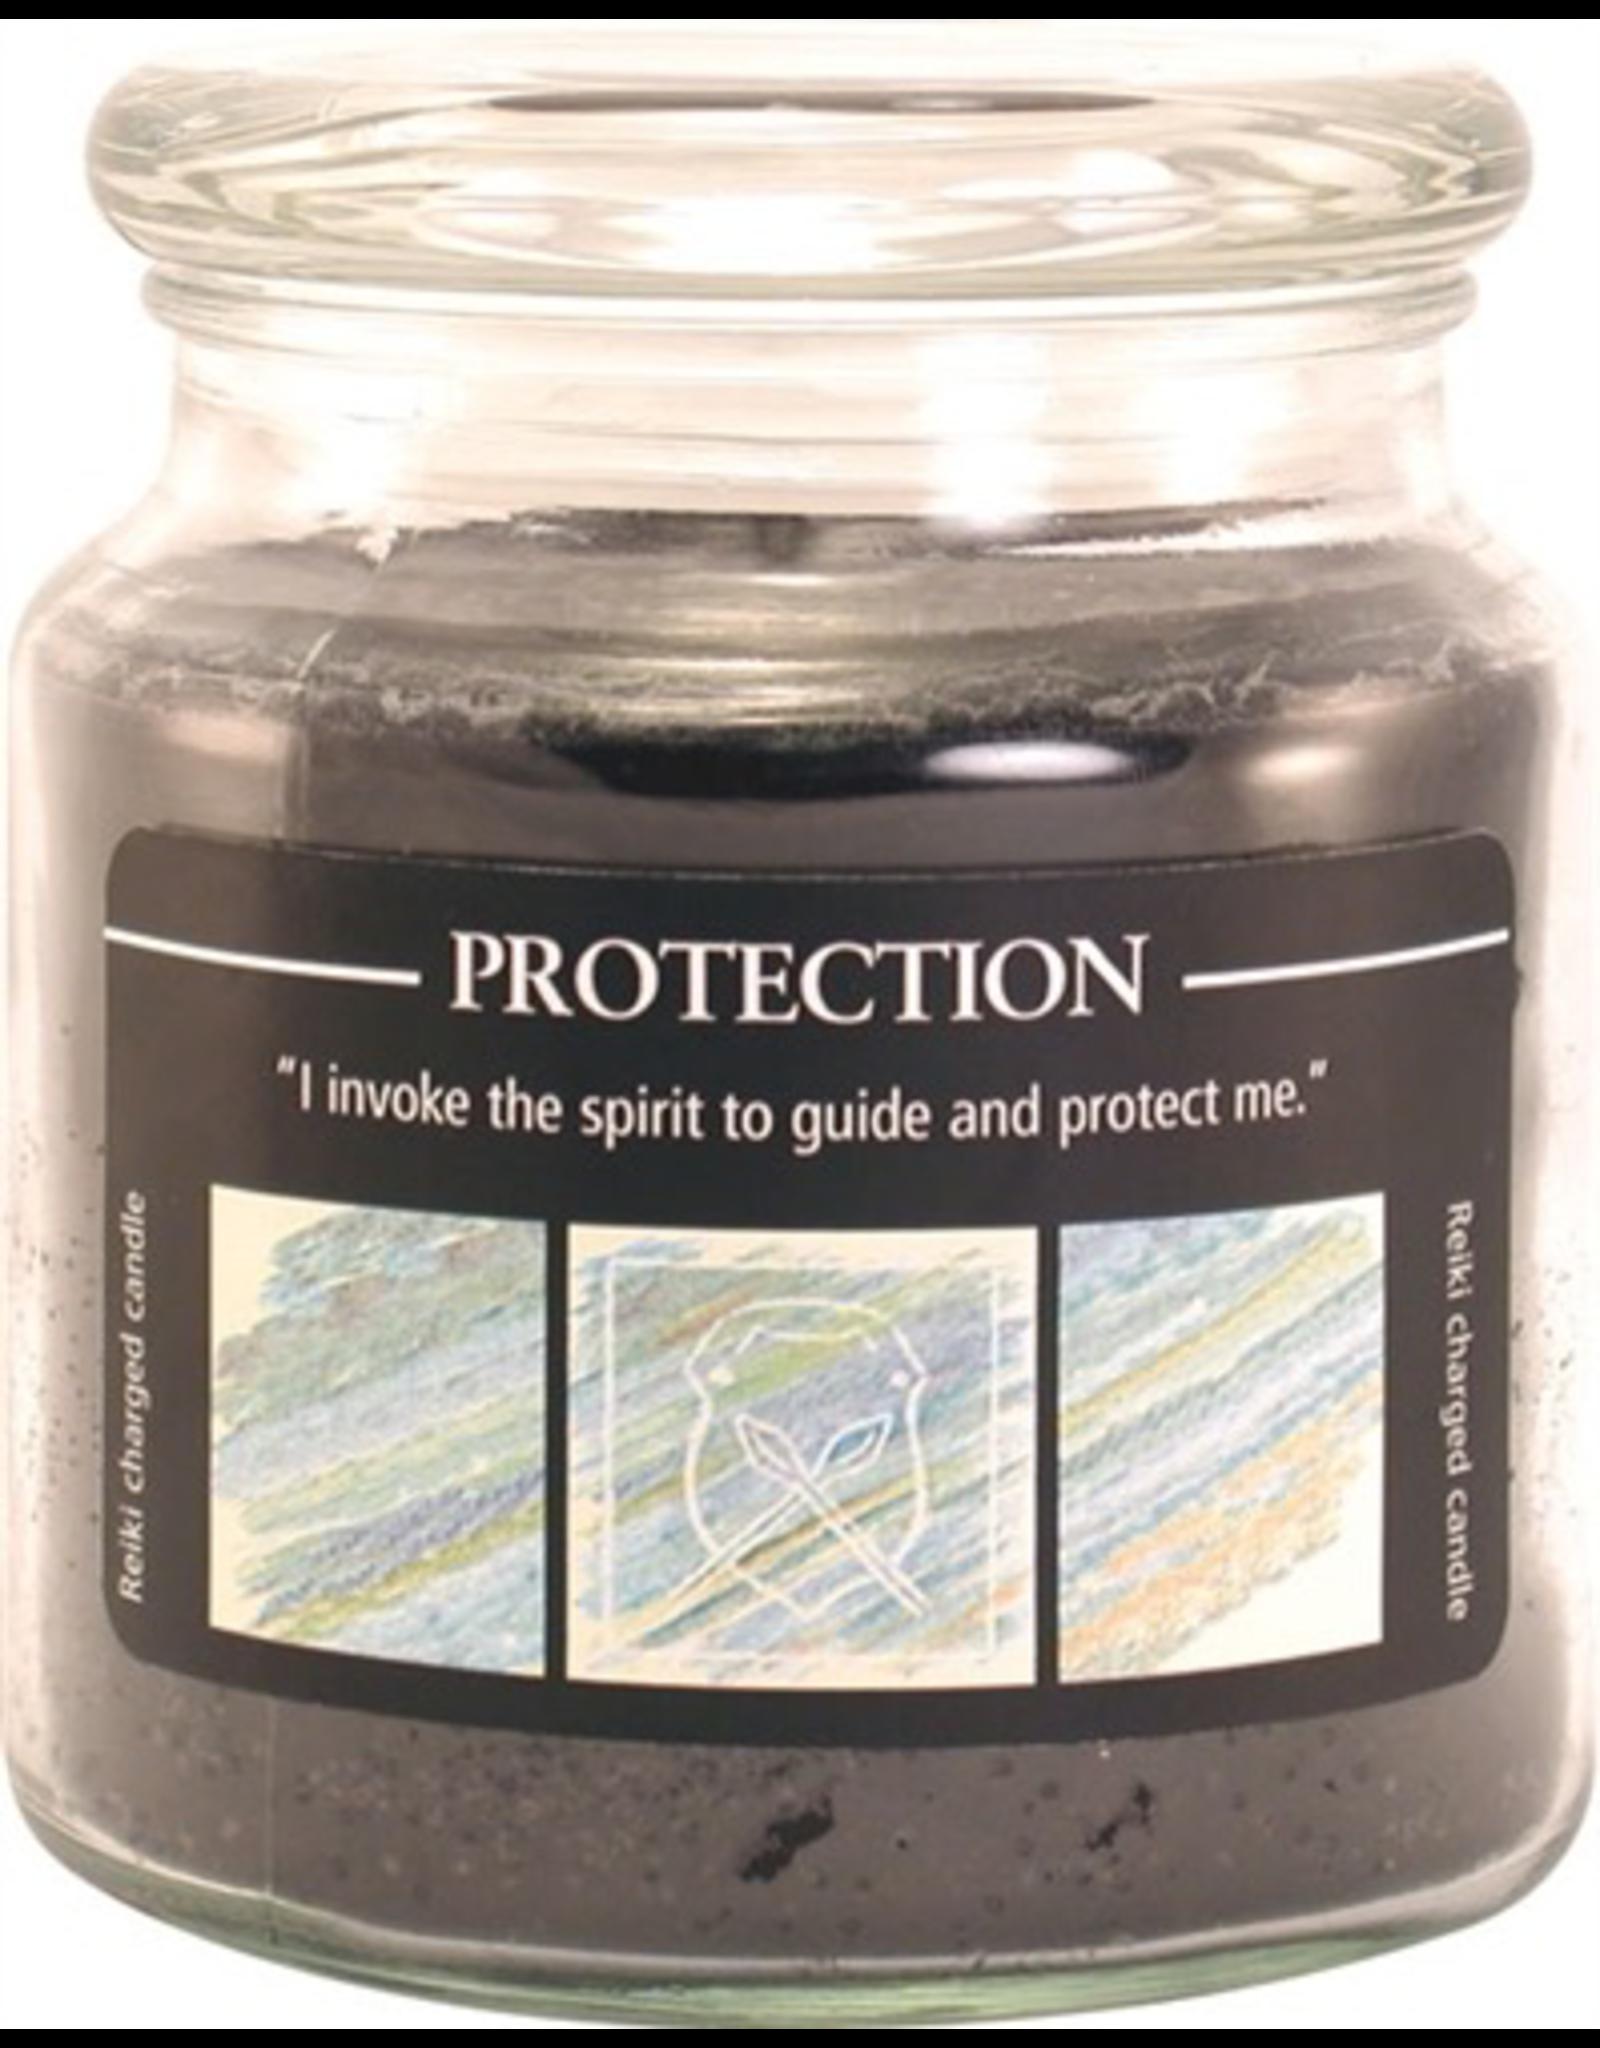 Crystal Journey 16 oz Protection Jar Candle